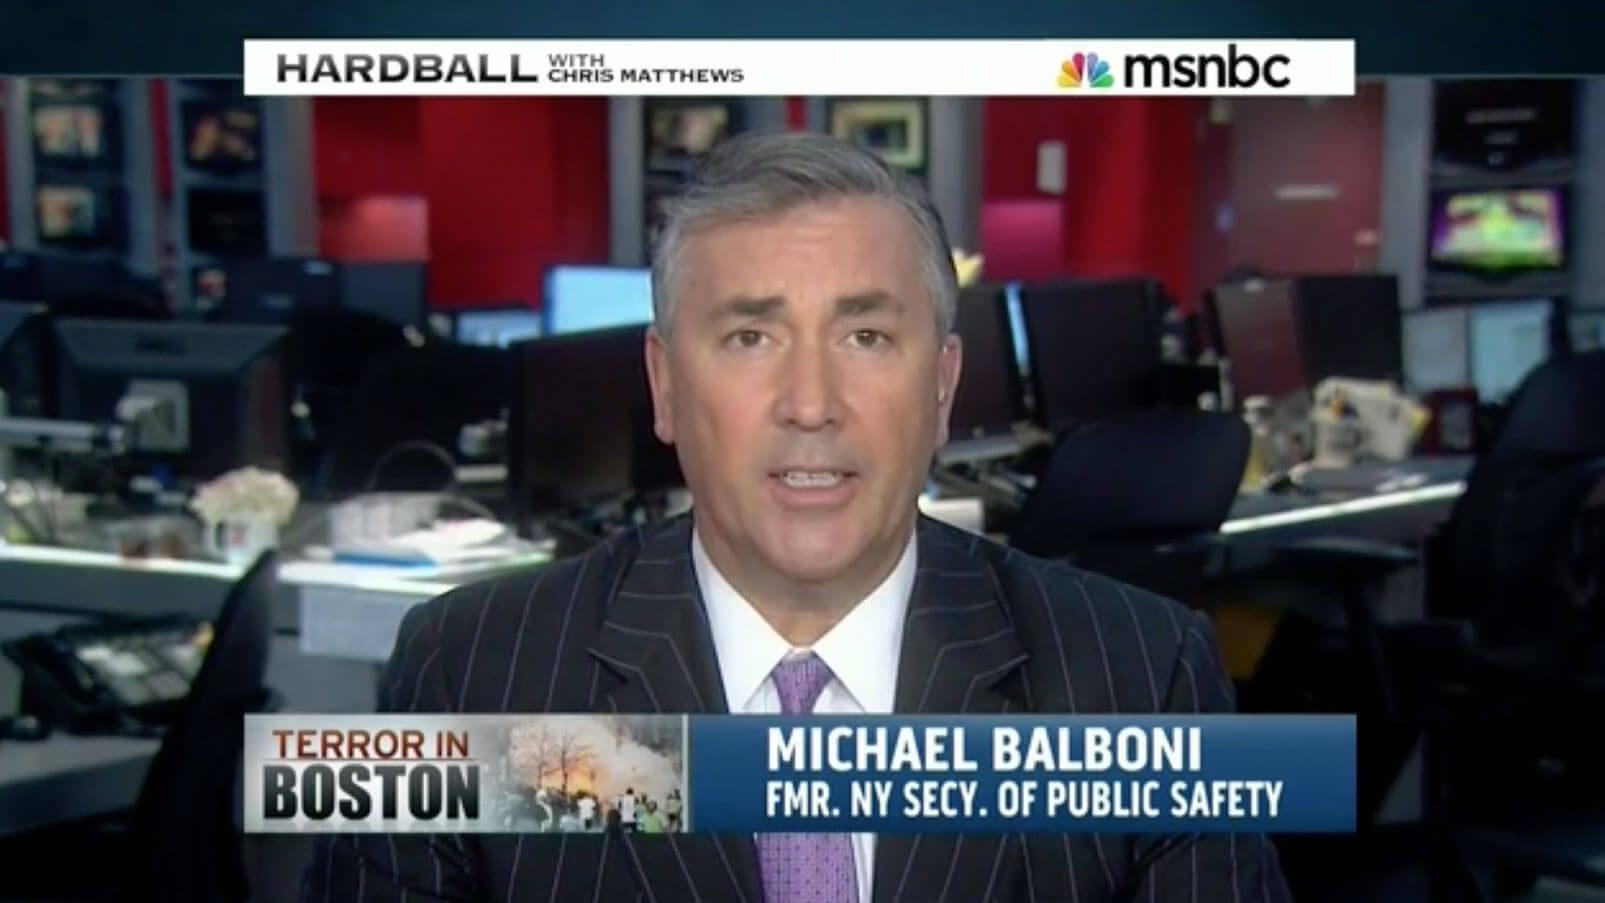 MSNBC – Hardball with Chris Matthews